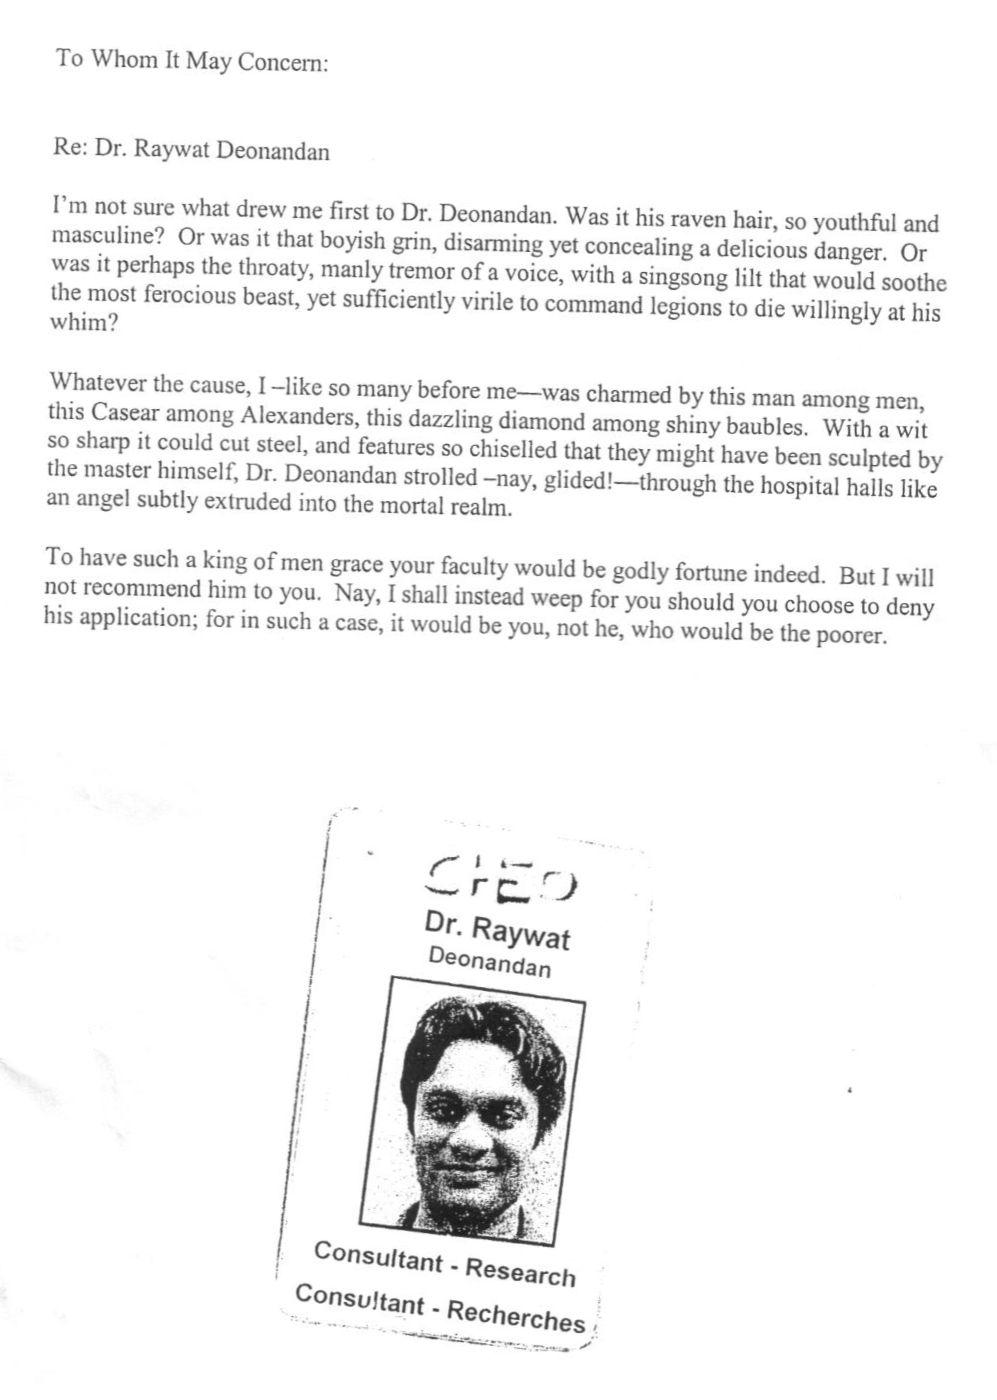 sample recommendation letter for my boss cover letter templates deonandia 10 2009